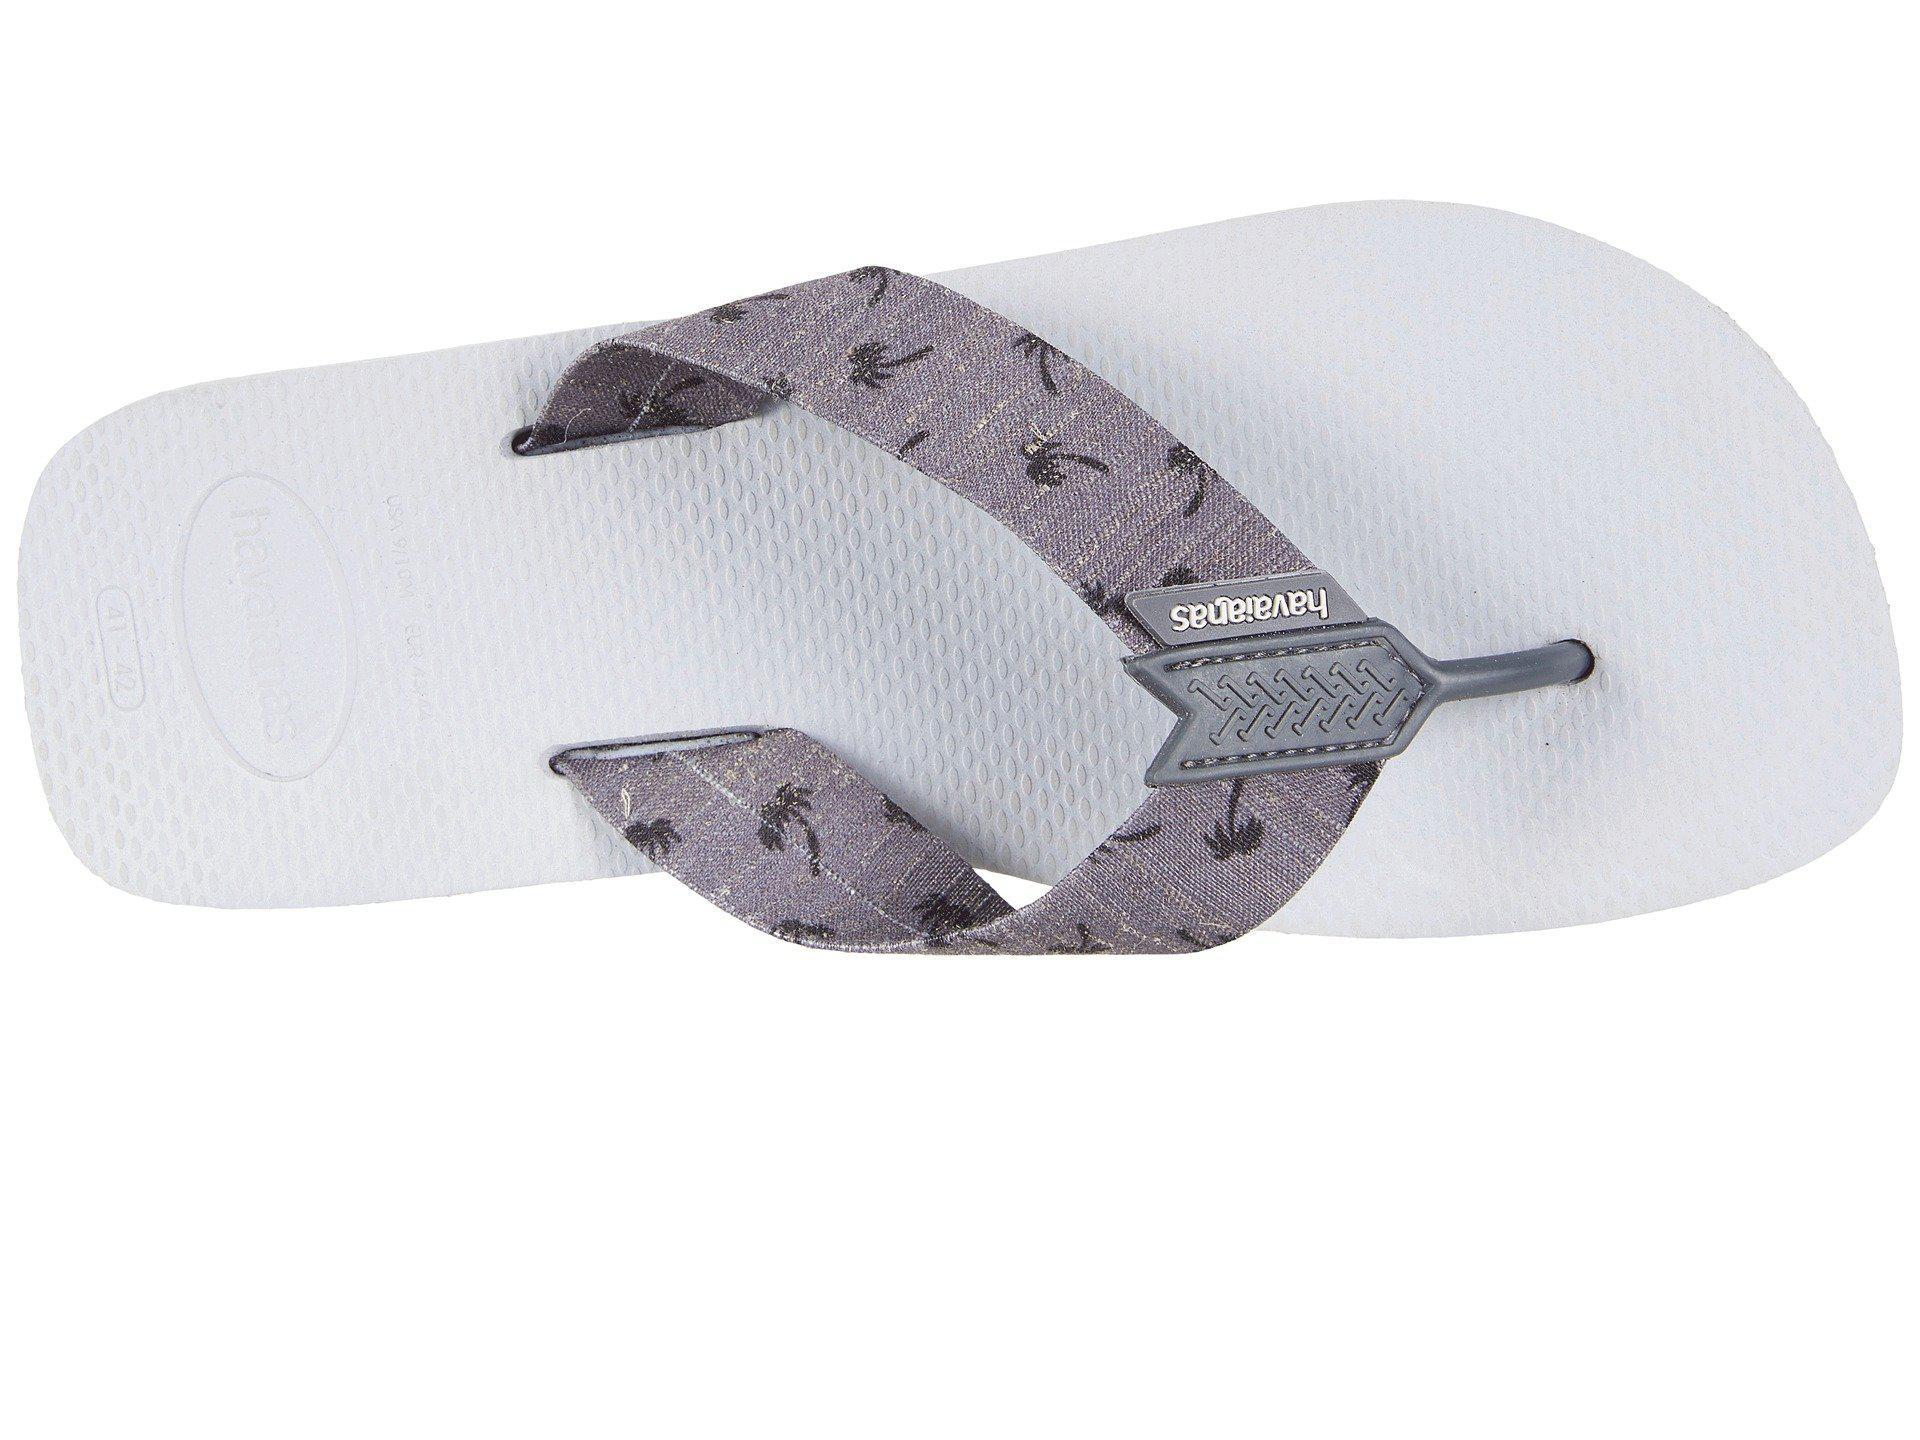 583004dd6106fb Havaianas Urban Series Flip Flops in Gray